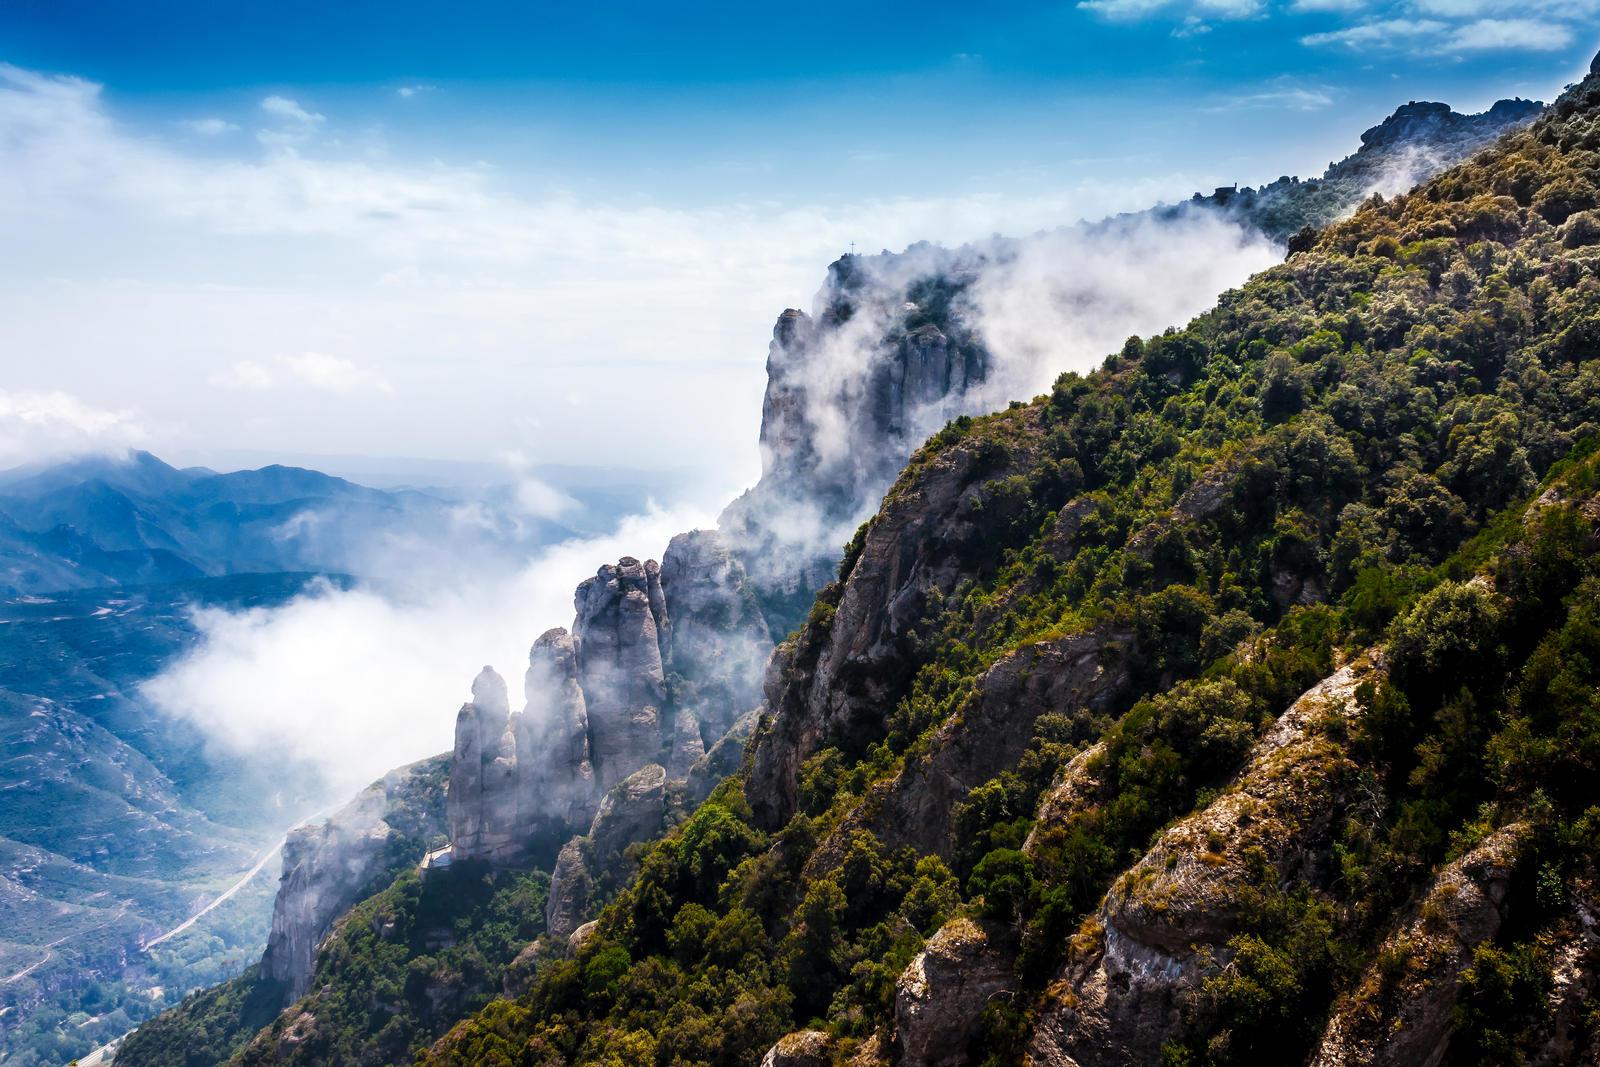 Montserrat Mist by TarJakArt